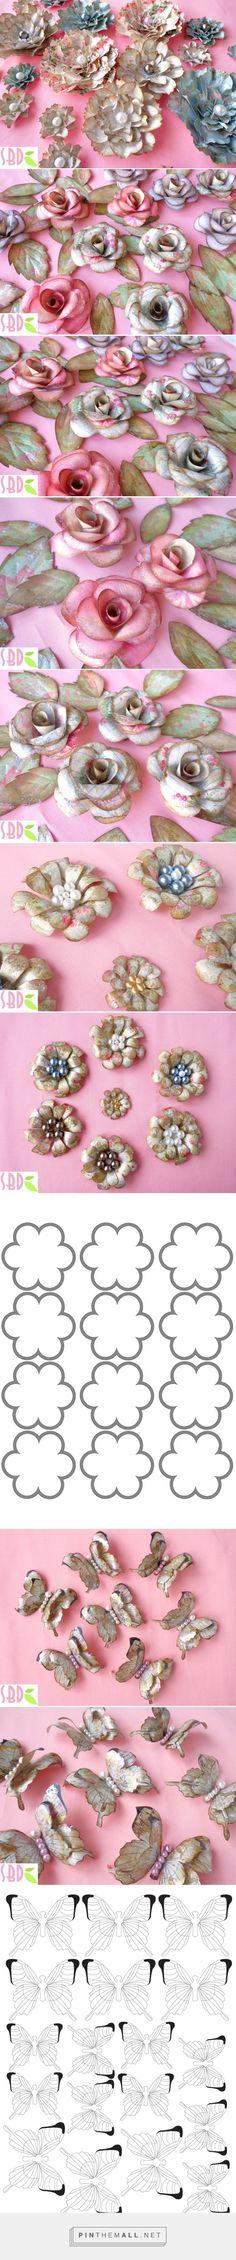 Sweet Bio design: Dipendente dai fiori di carta! - paper Flower addicted!... - a grouped images picture - Pin Them All